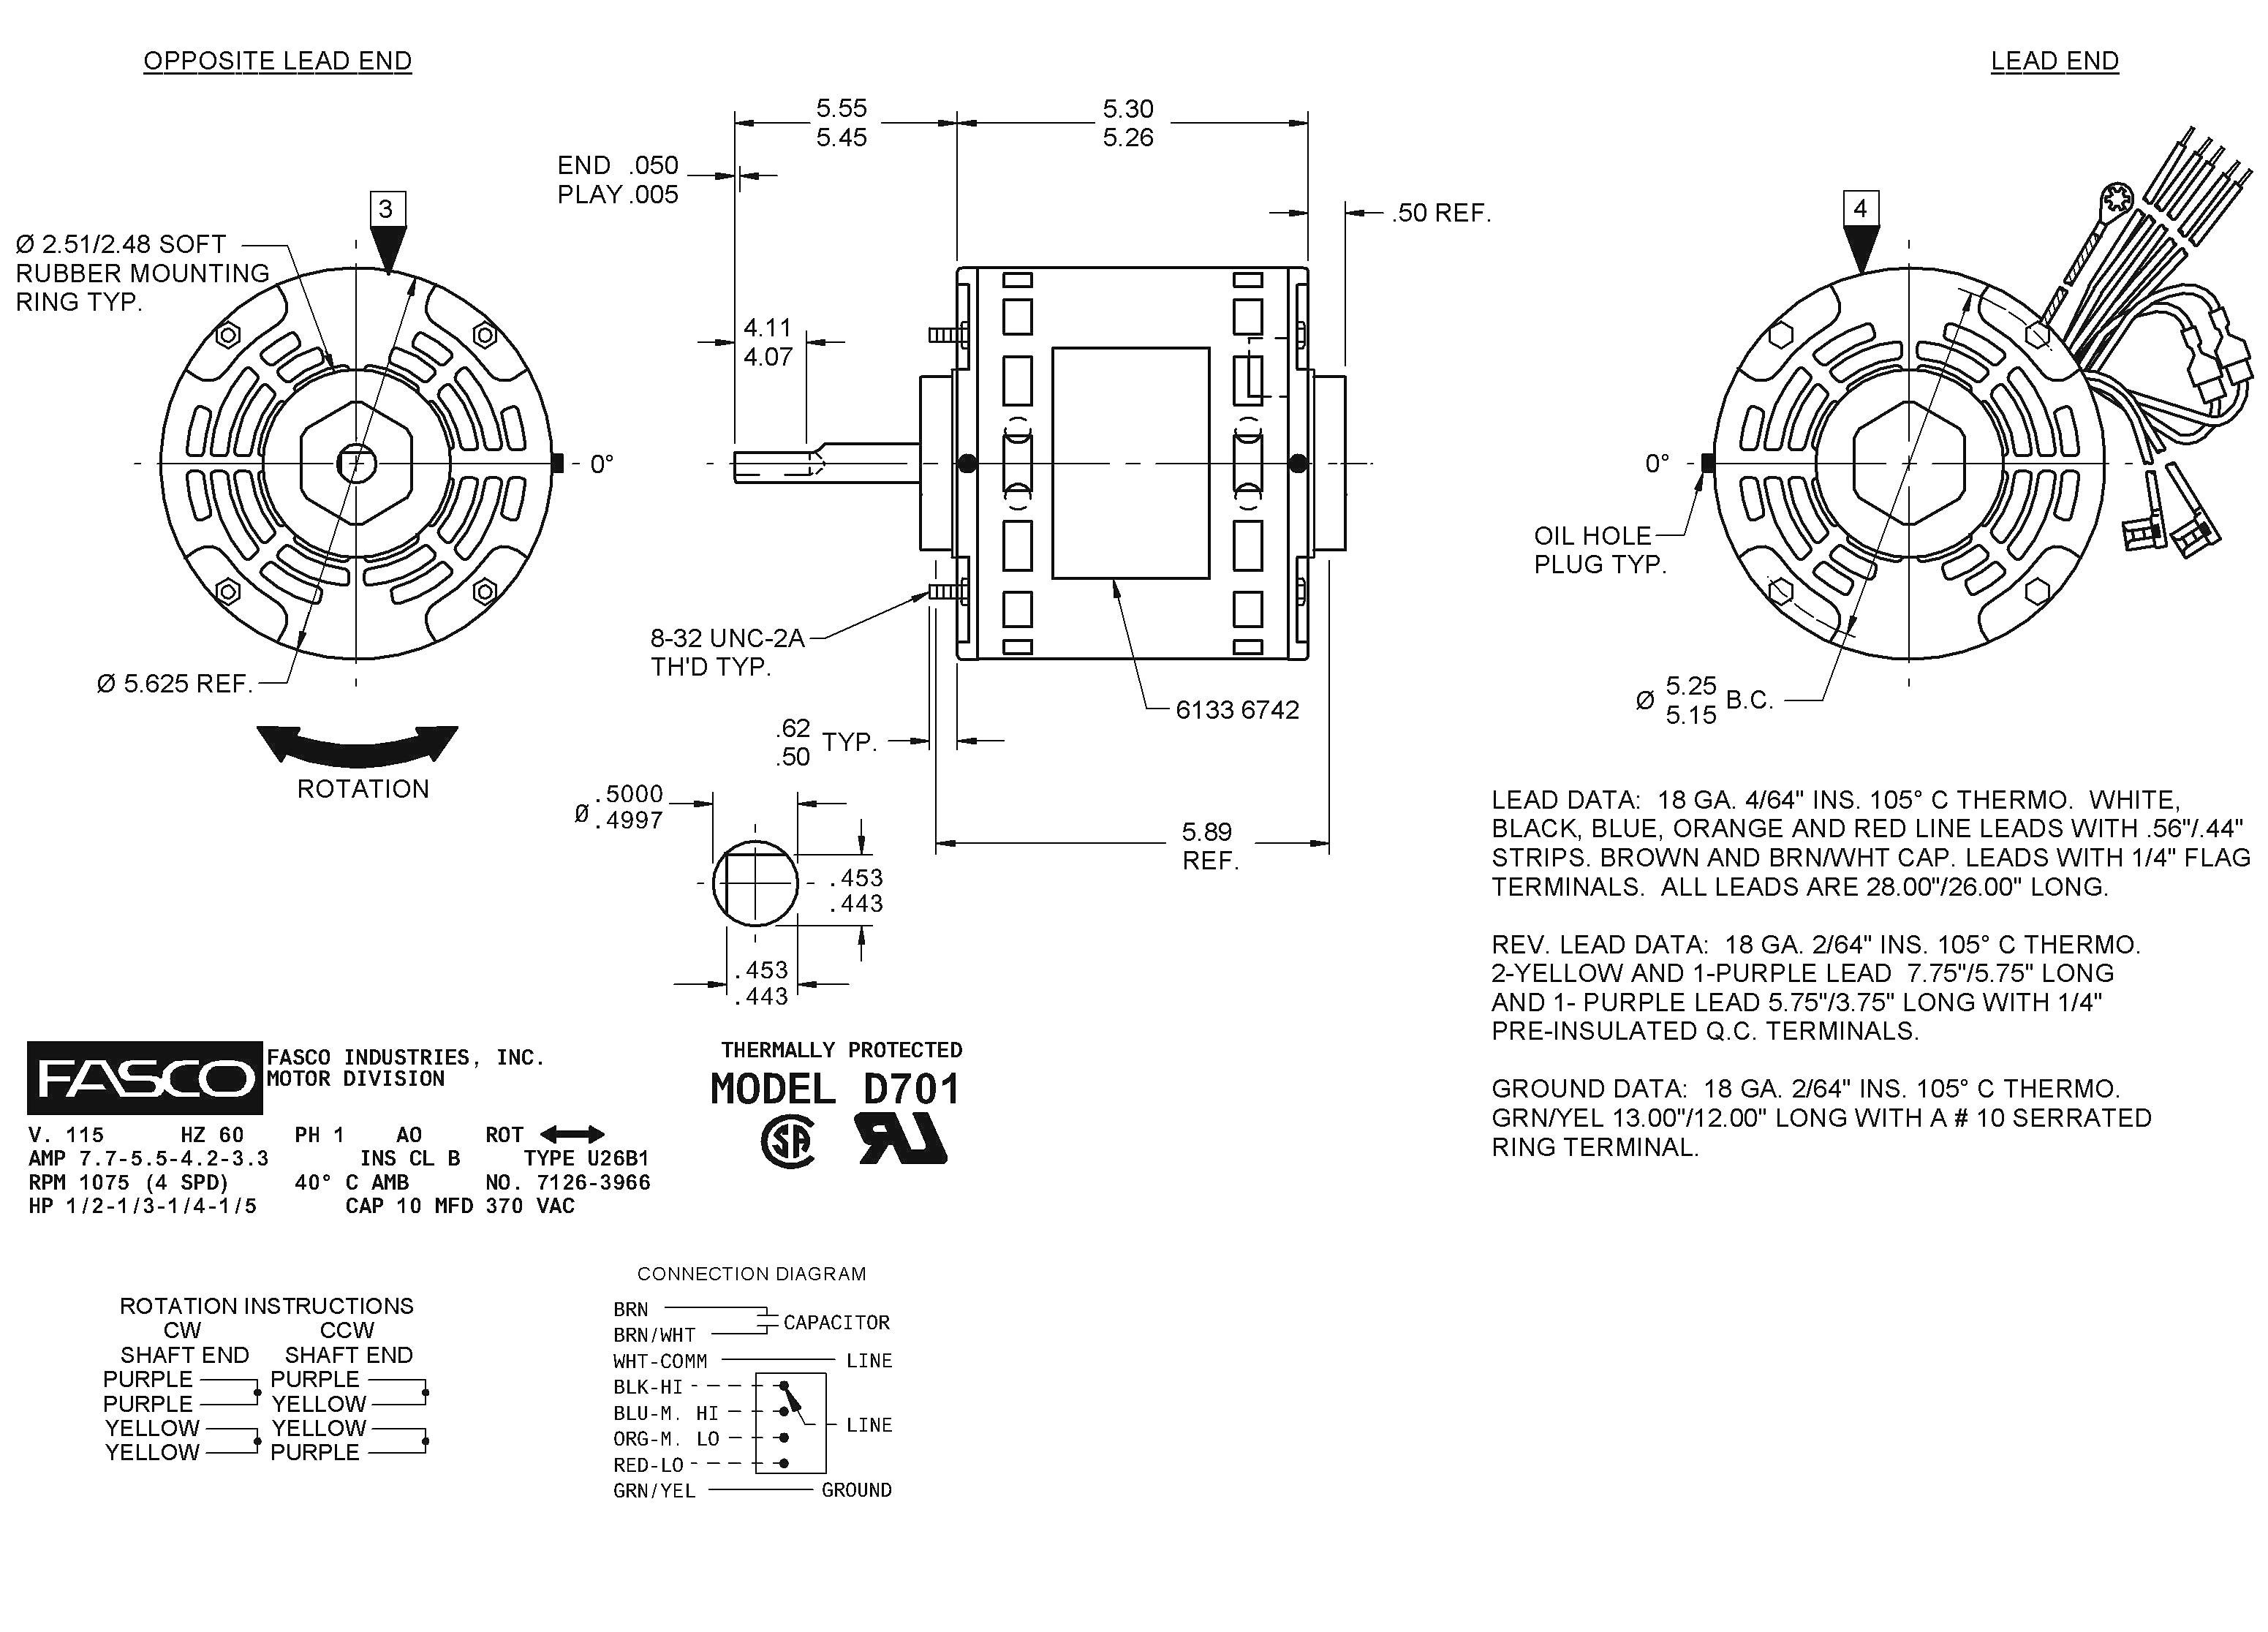 electric motors wiring diagram doerr box wiring diagramdoerr single phase wiring diagram 1 wiring diagram source bodine electric motor wiring diagram electric motors wiring diagram doerr